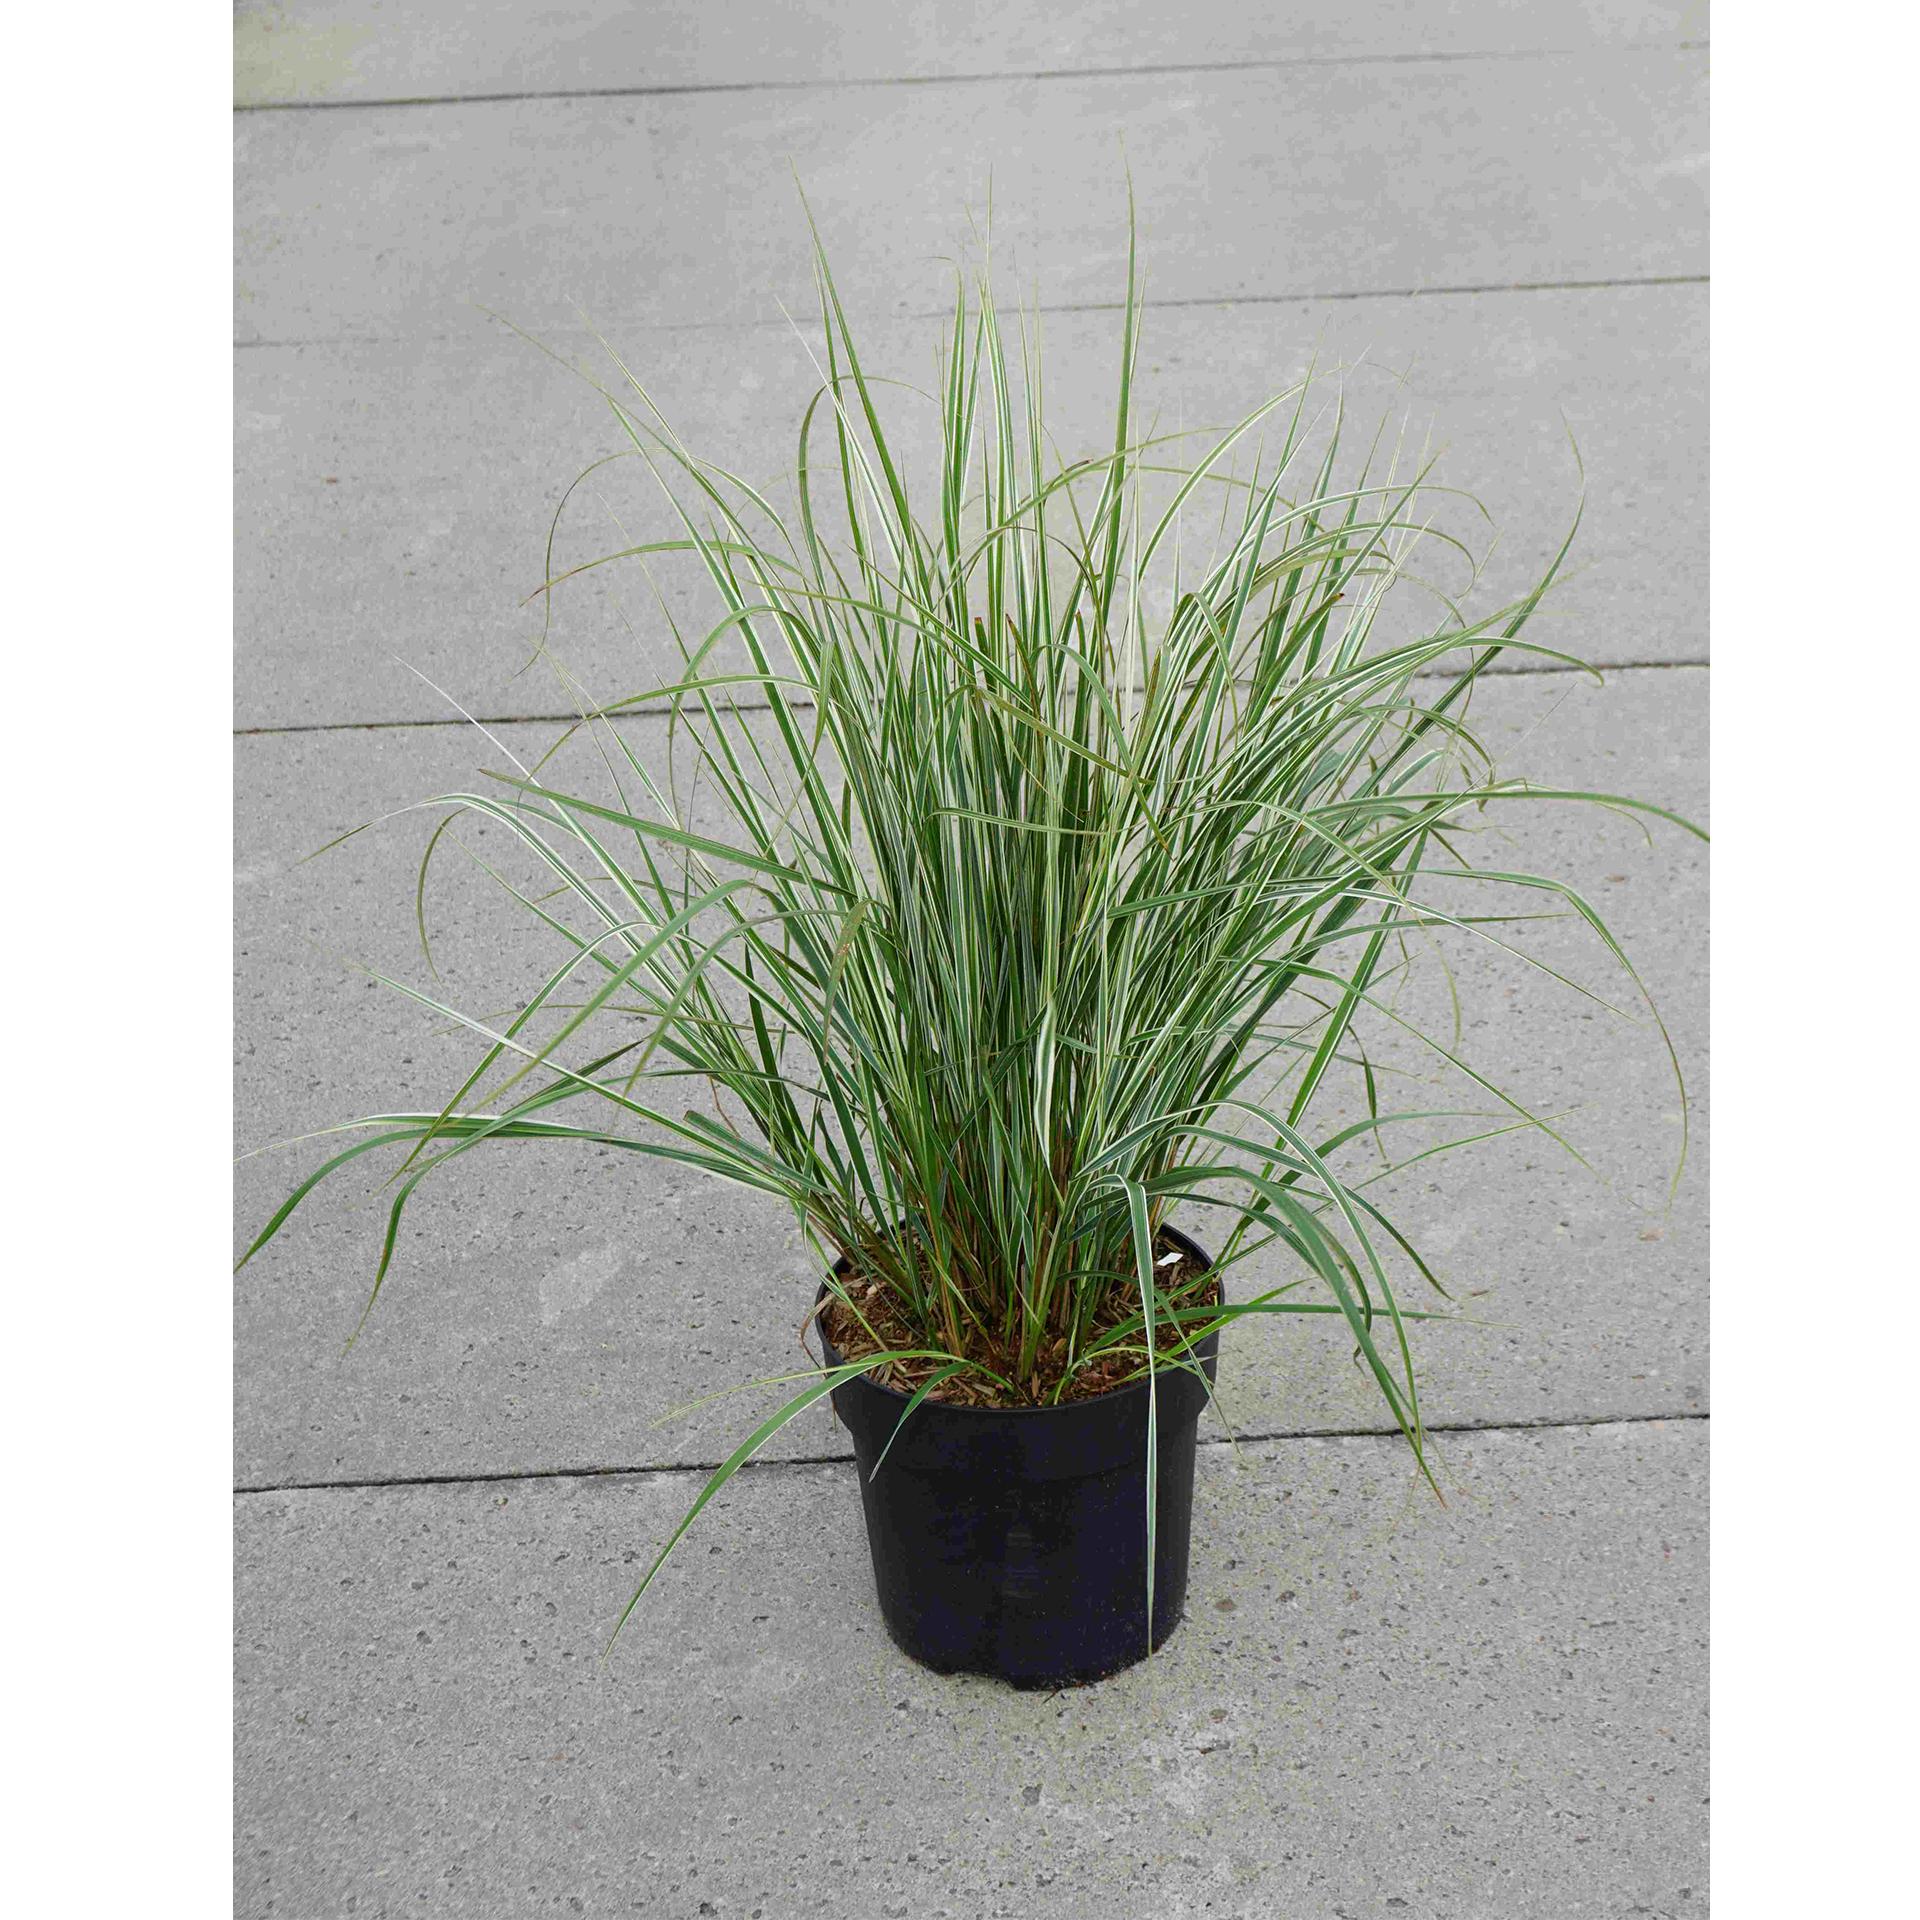 Gestreiftes Reitgras - Calamagrostis acutiflora 'Overdam', C6